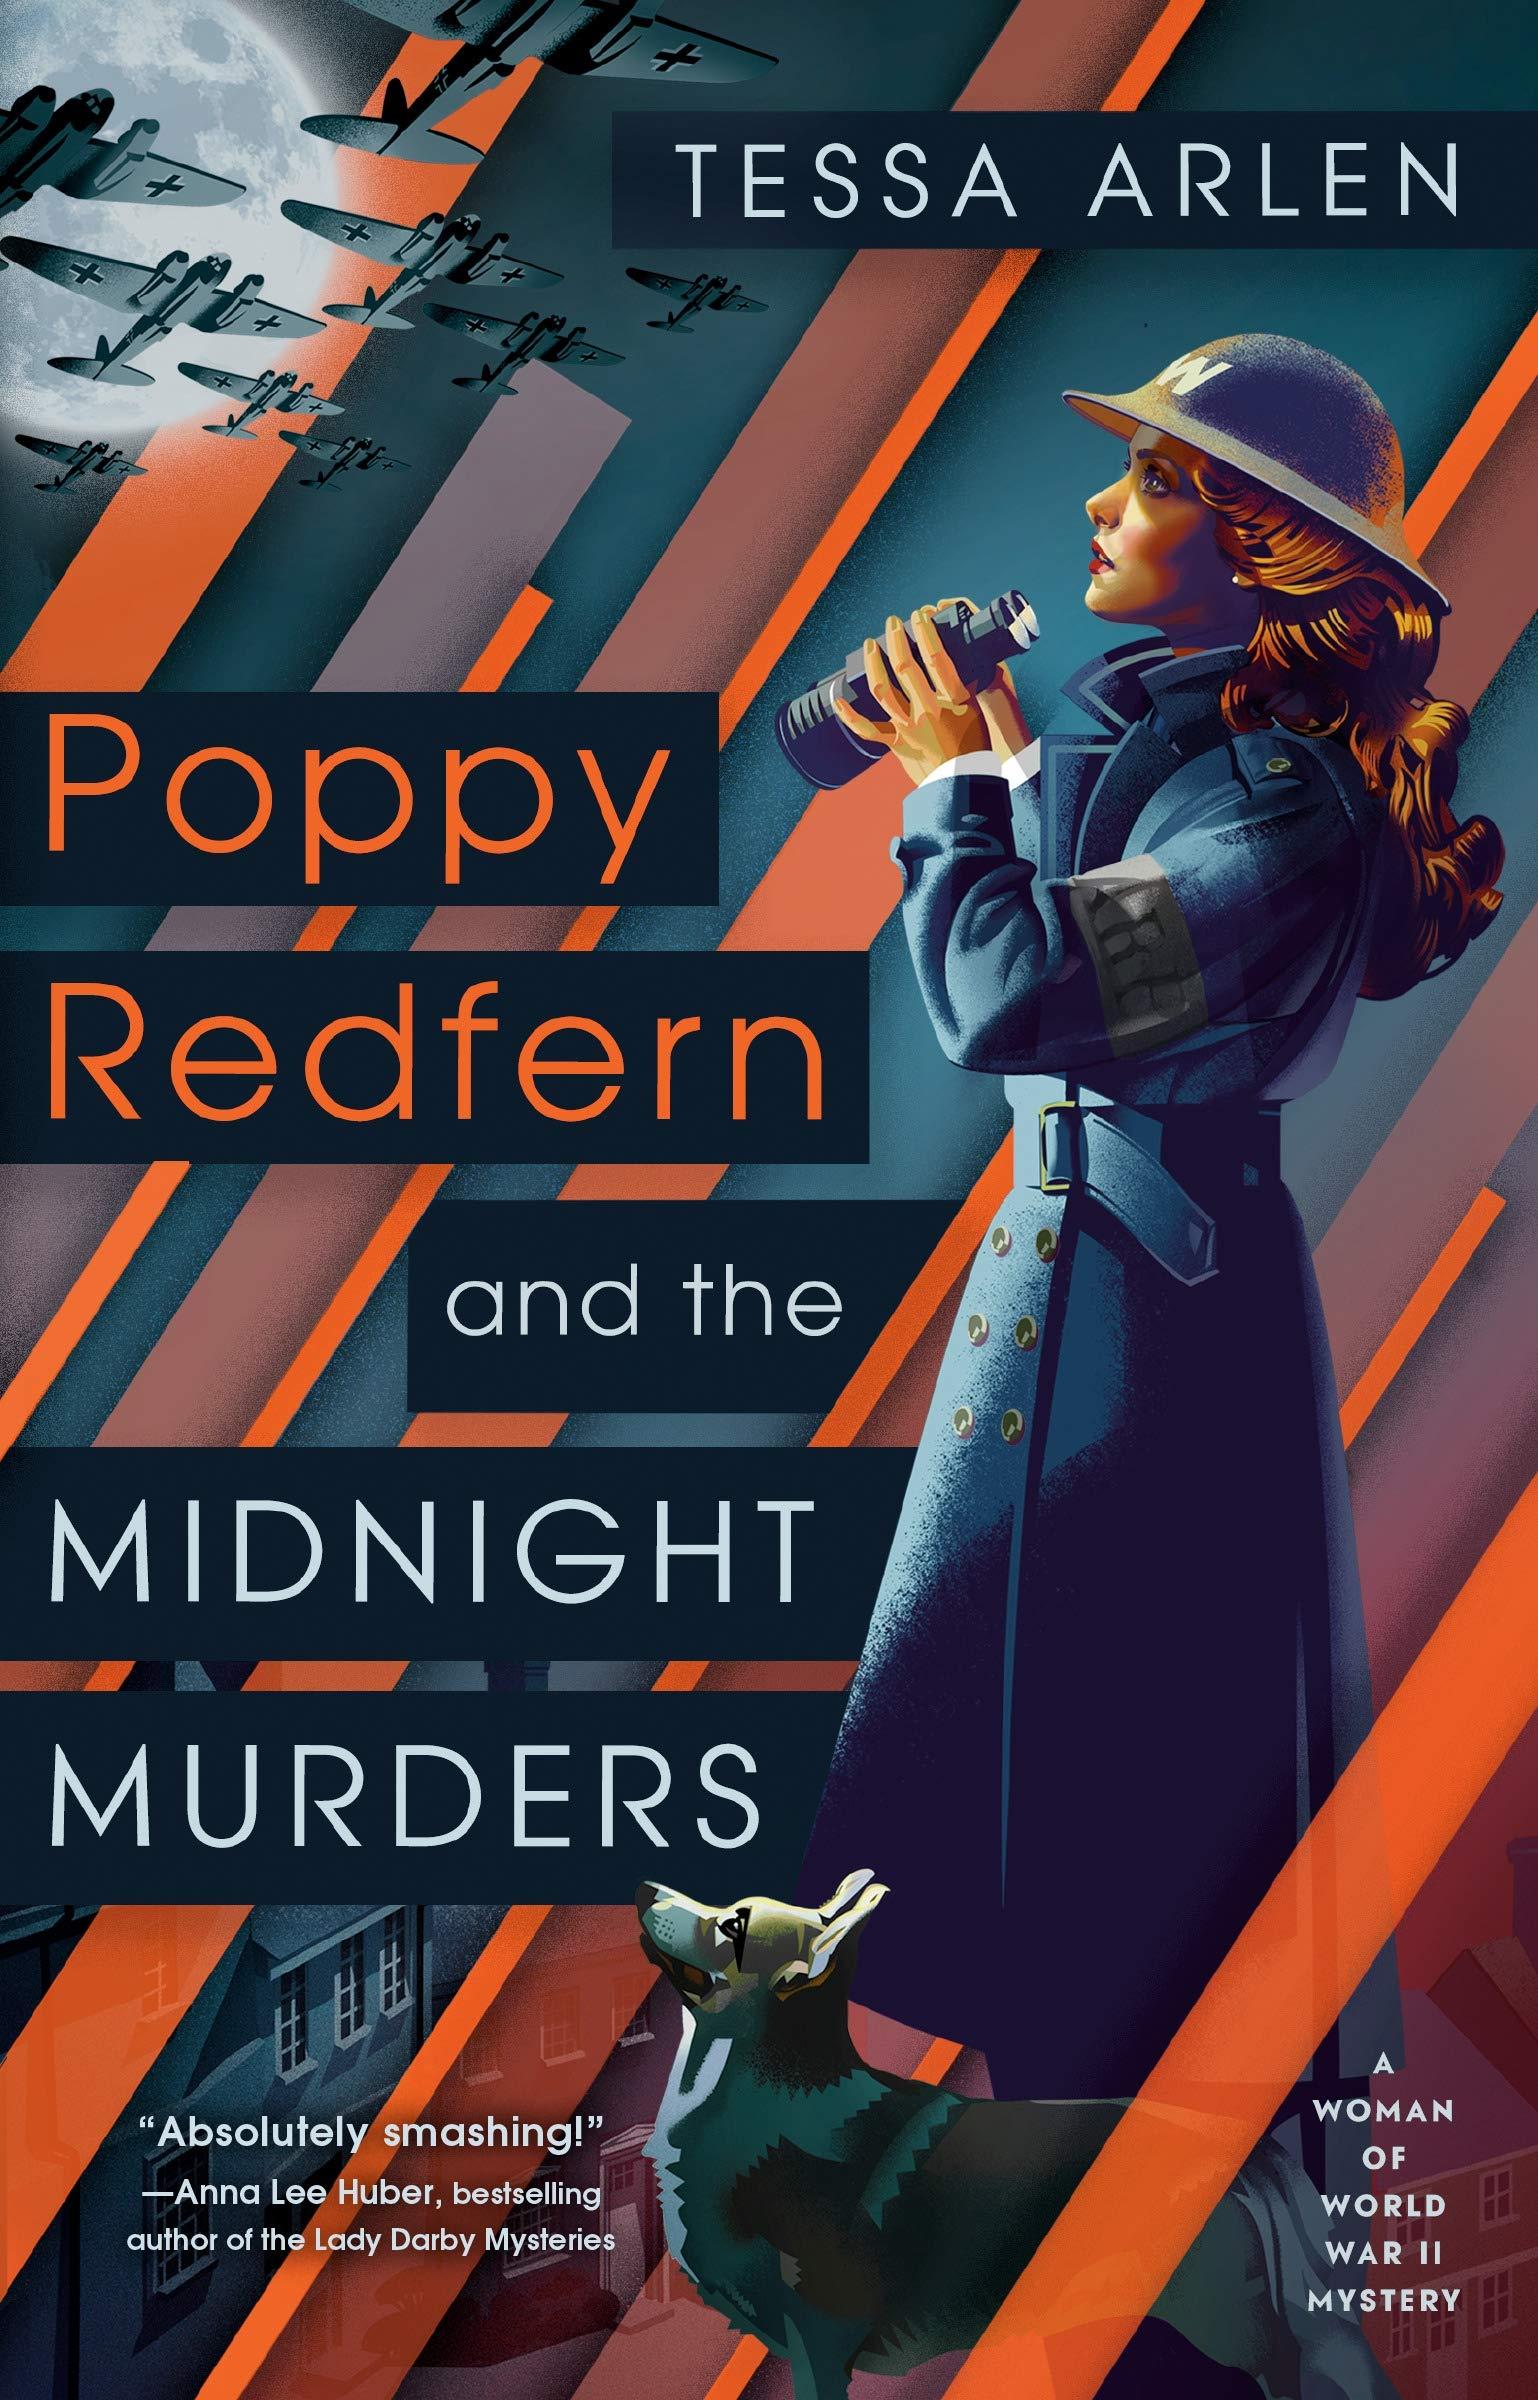 Amazon Com Poppy Redfern And The Midnight Murders A Woman Of Wwii Mystery 9781984805805 Arlen Tessa Books